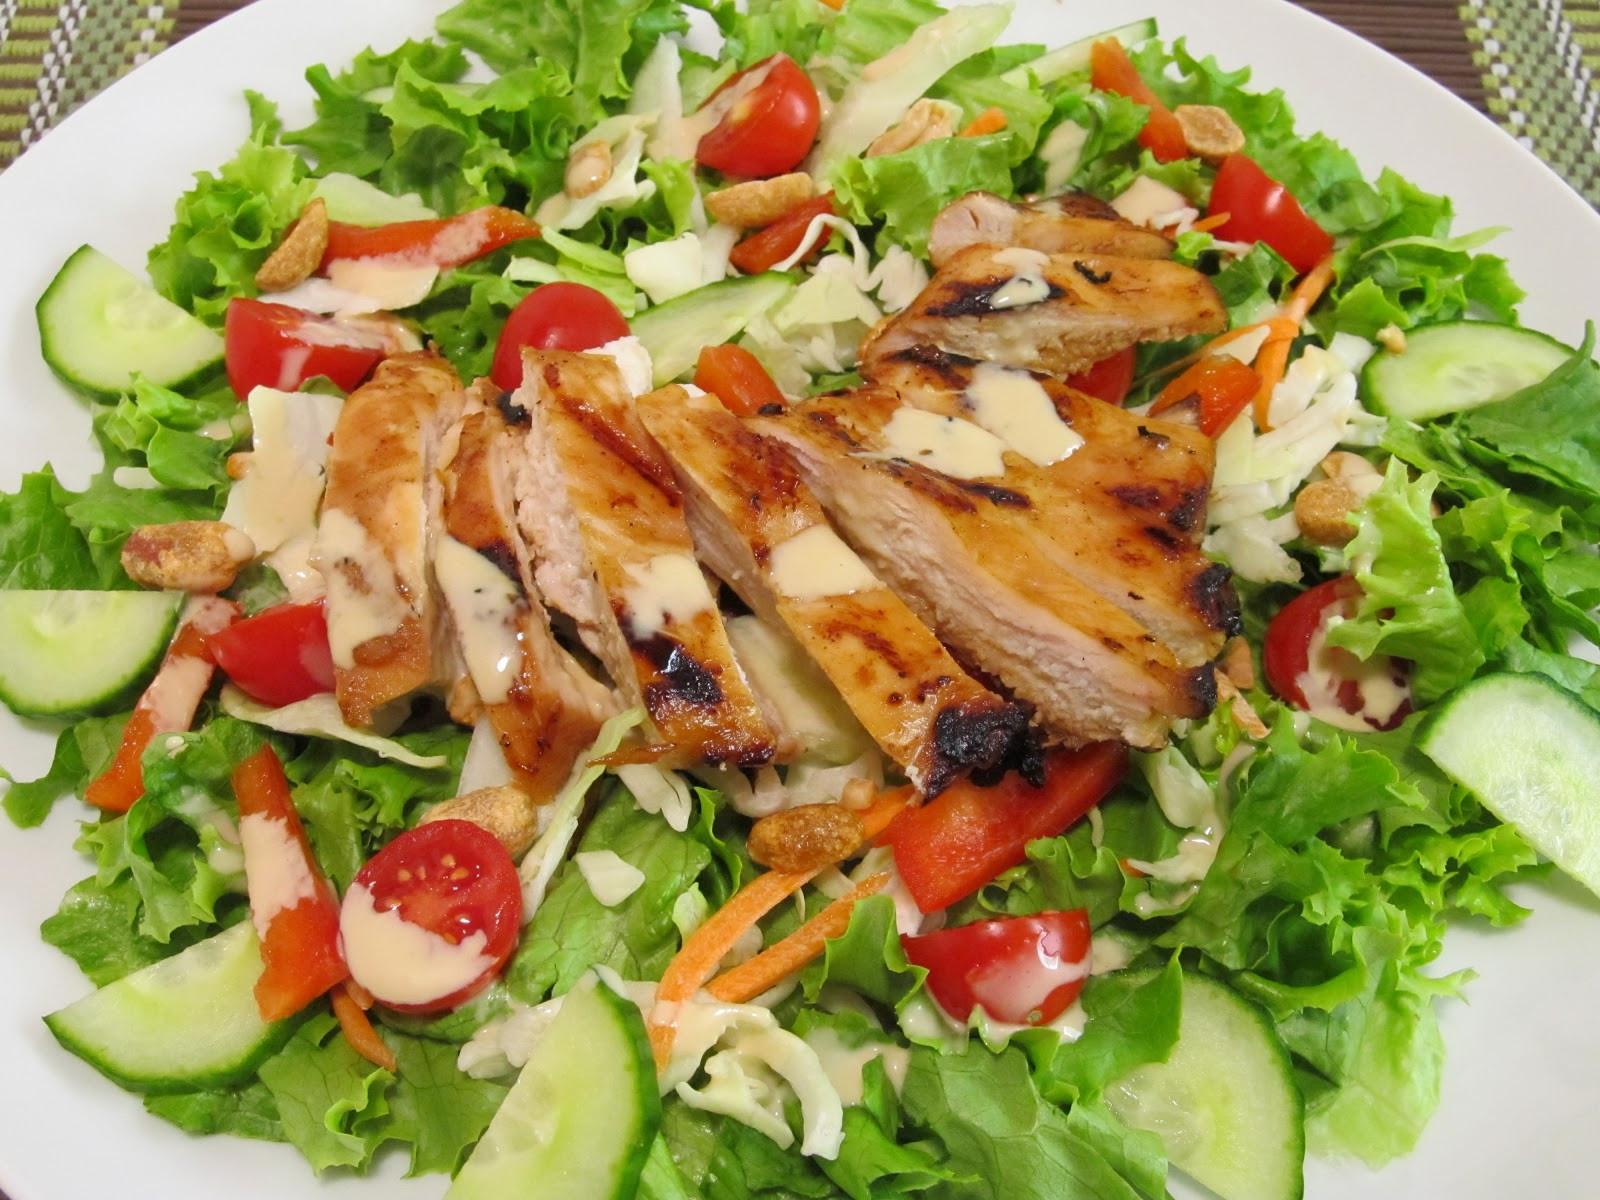 Teriyaki Chicken Salad  Bevaris Alliance Teriyaki Chicken Salad